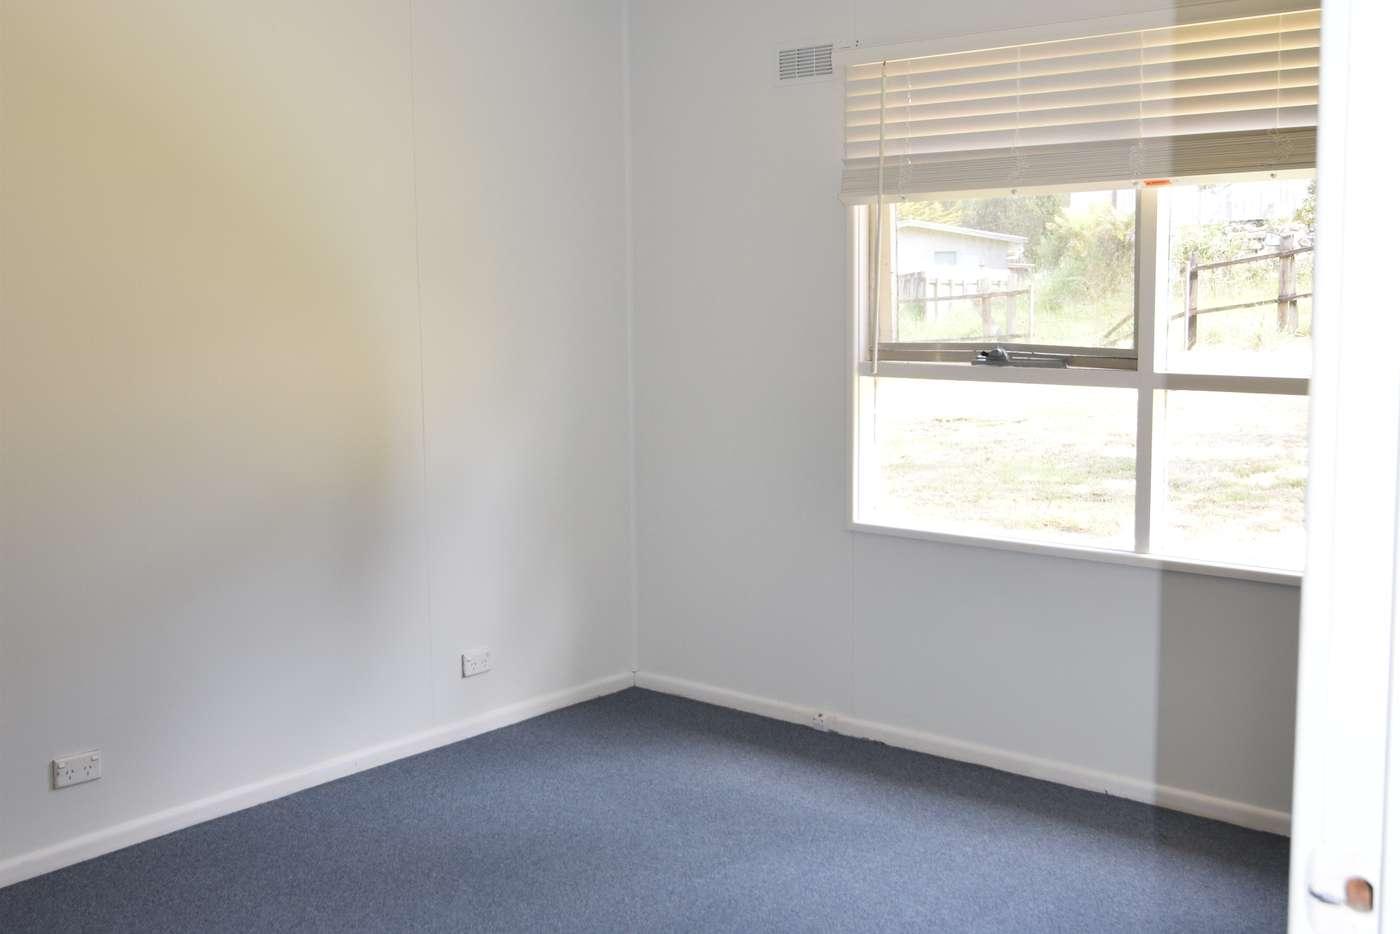 Seventh view of Homely house listing, 57 Main Street, Zeehan TAS 7469